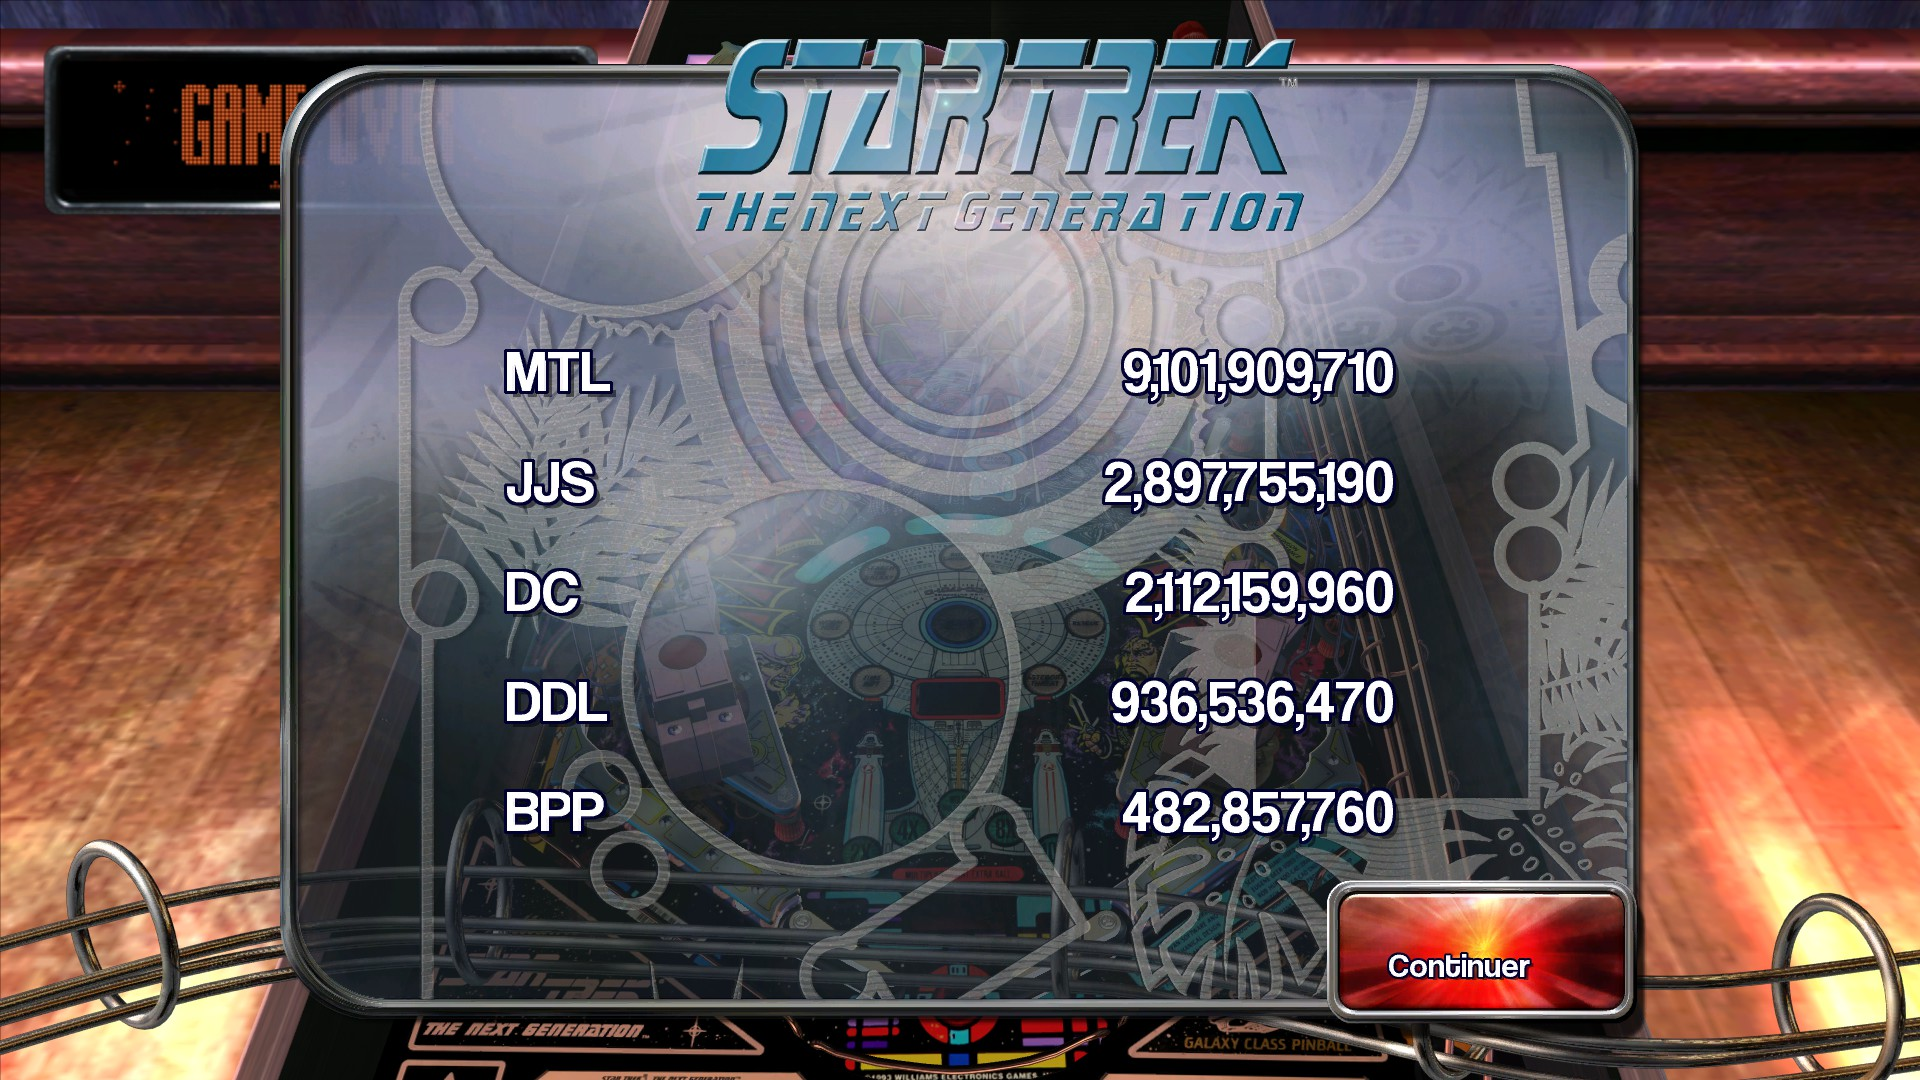 Mantalow: Pinball Arcade: Star Trek: The Next Generation (PC) 9,101,909,710 points on 2015-08-28 11:56:15